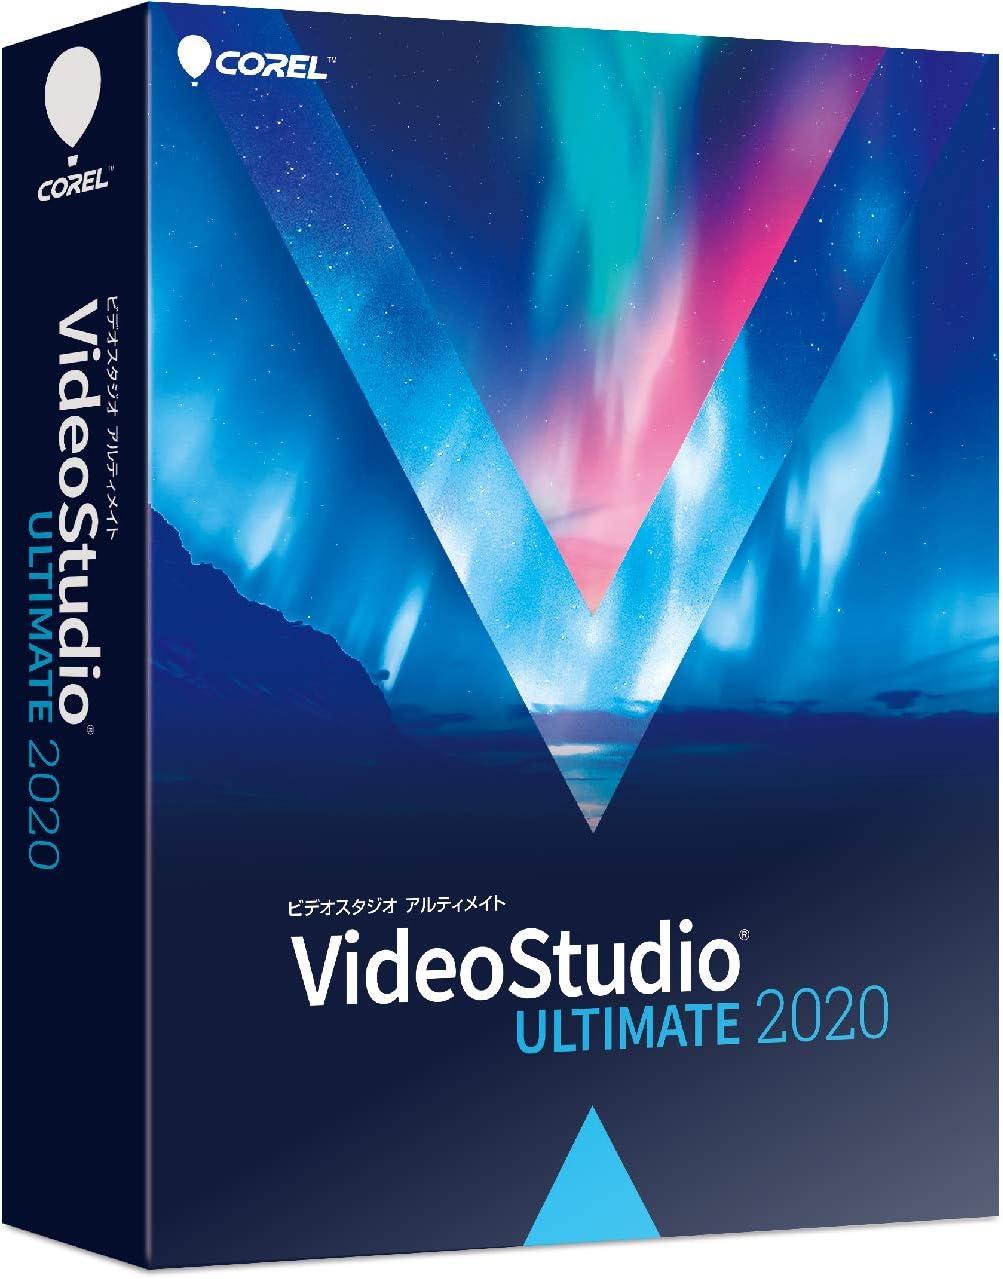 VideoStudio 2020 Ultimate